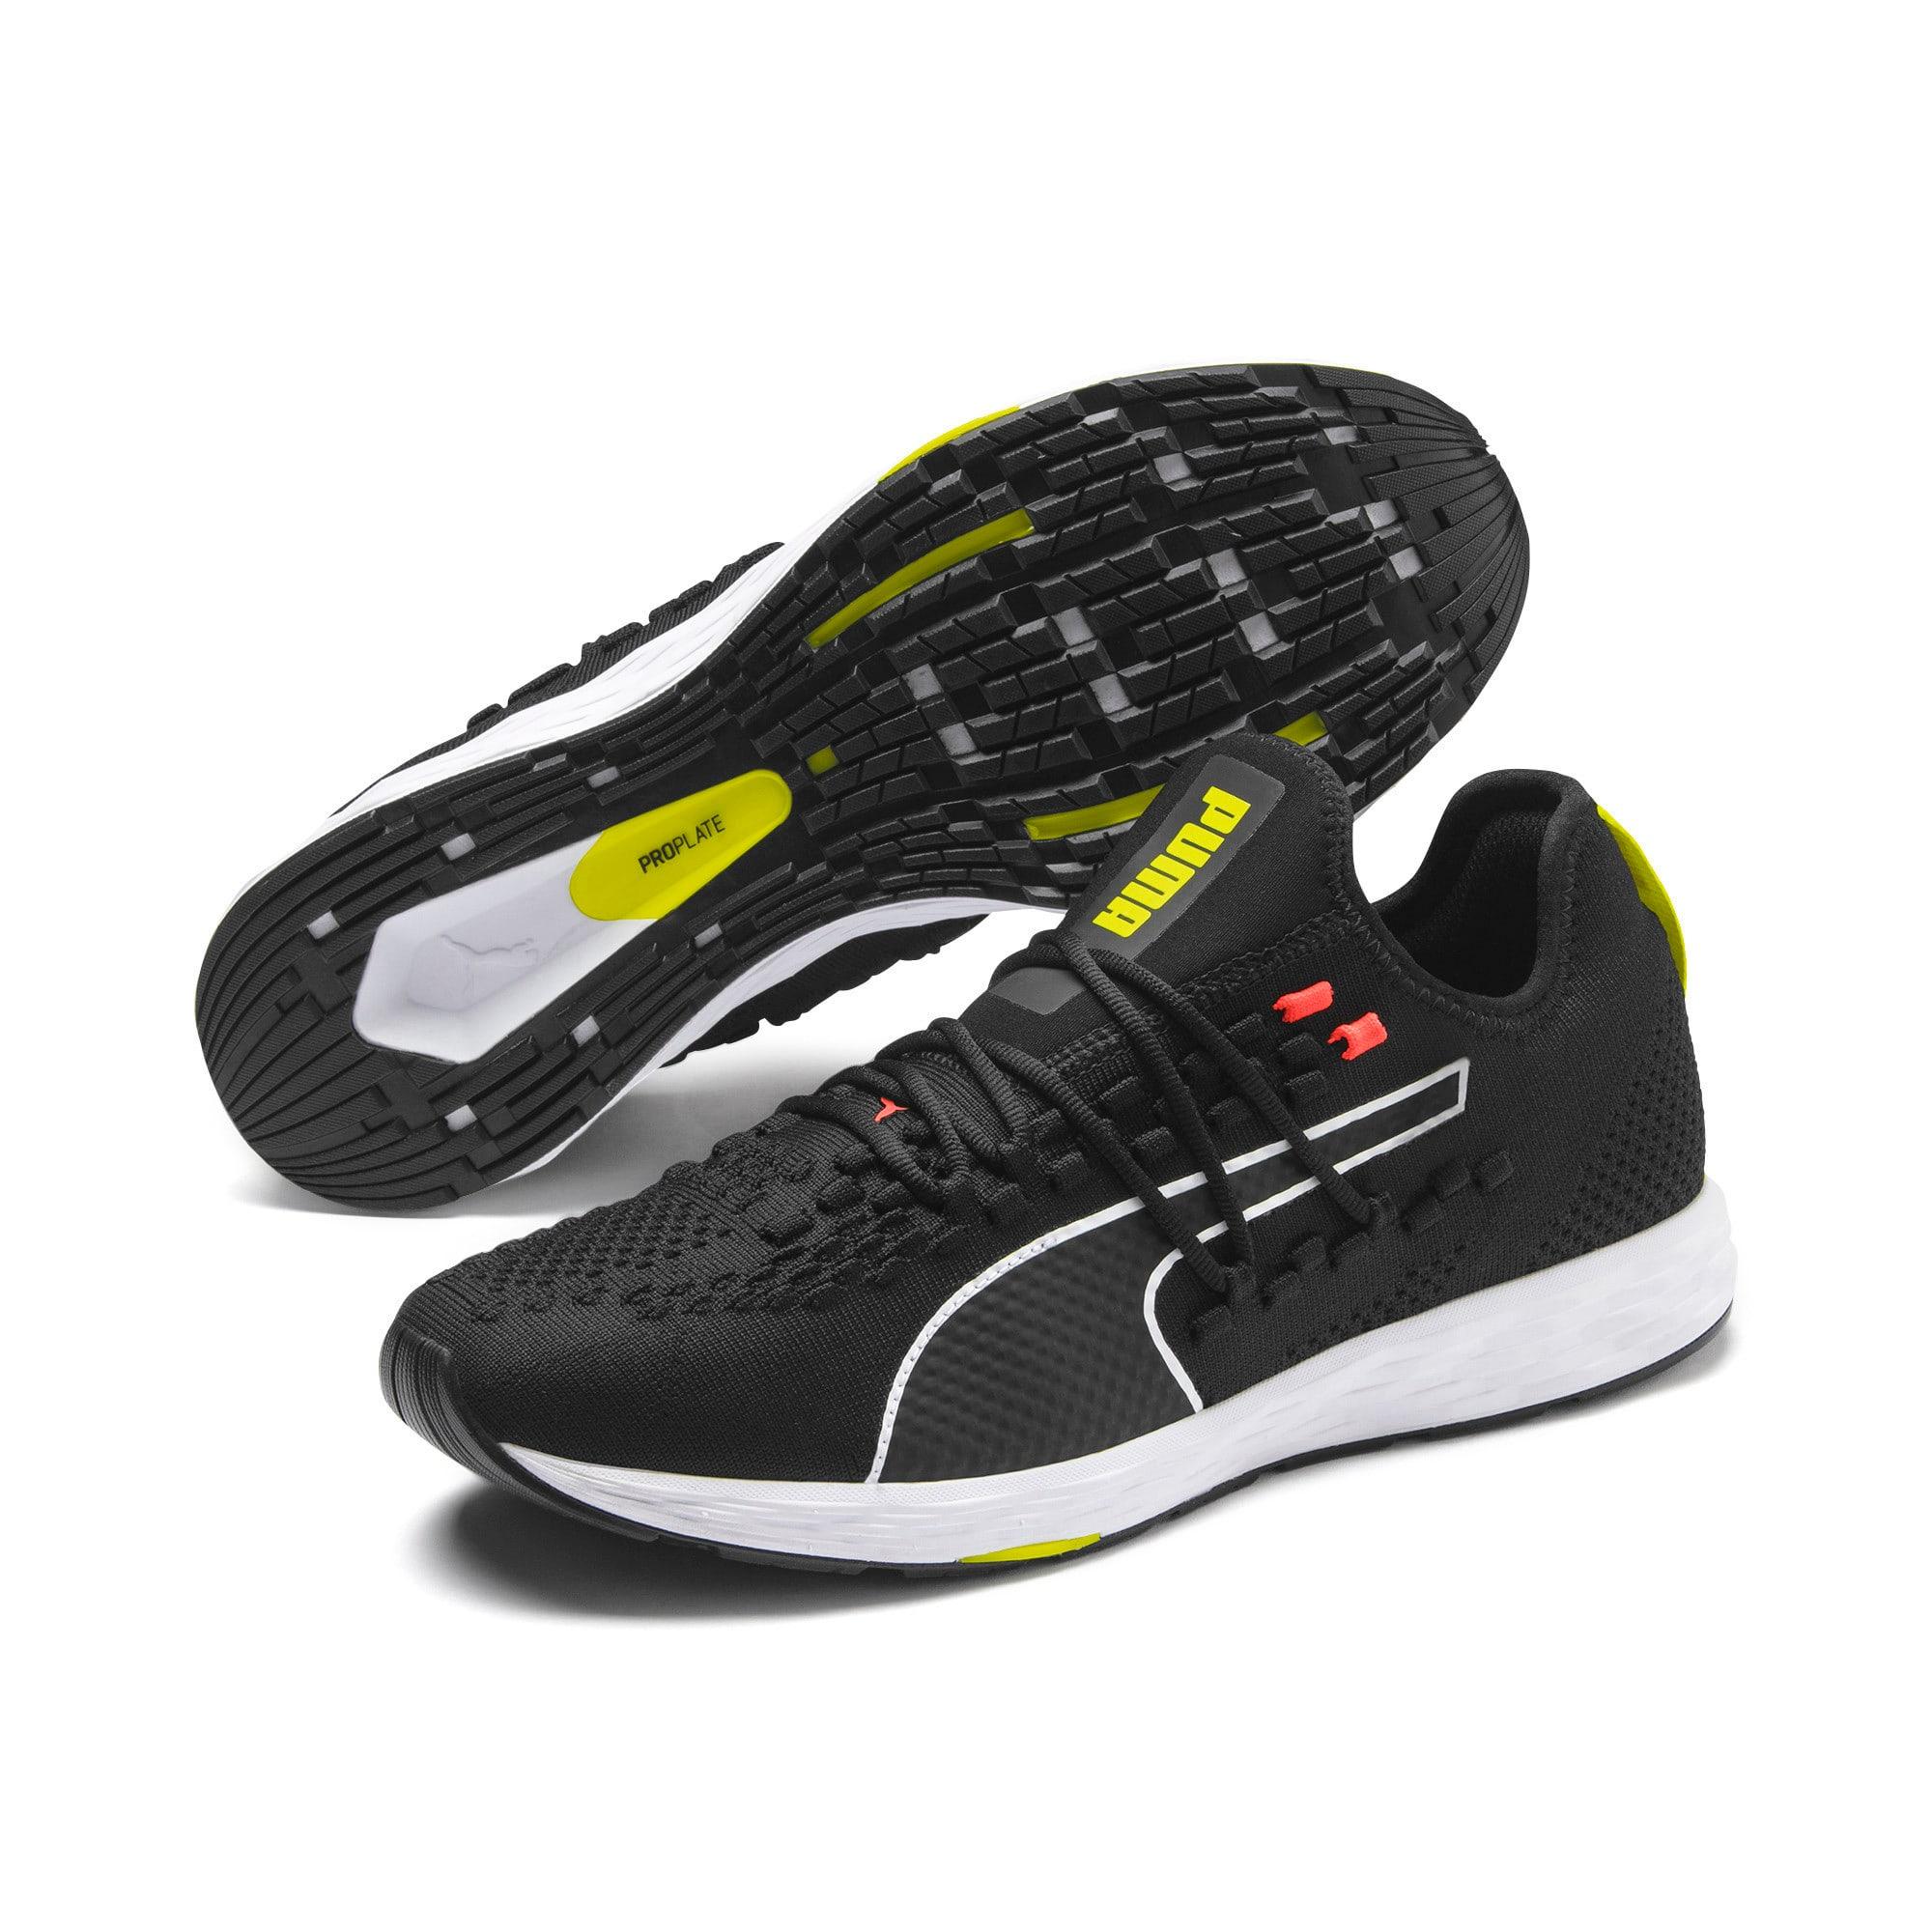 Thumbnail 3 of SPEED RACER Running Shoes, Black-Nrgy Red-Yellow Alert, medium